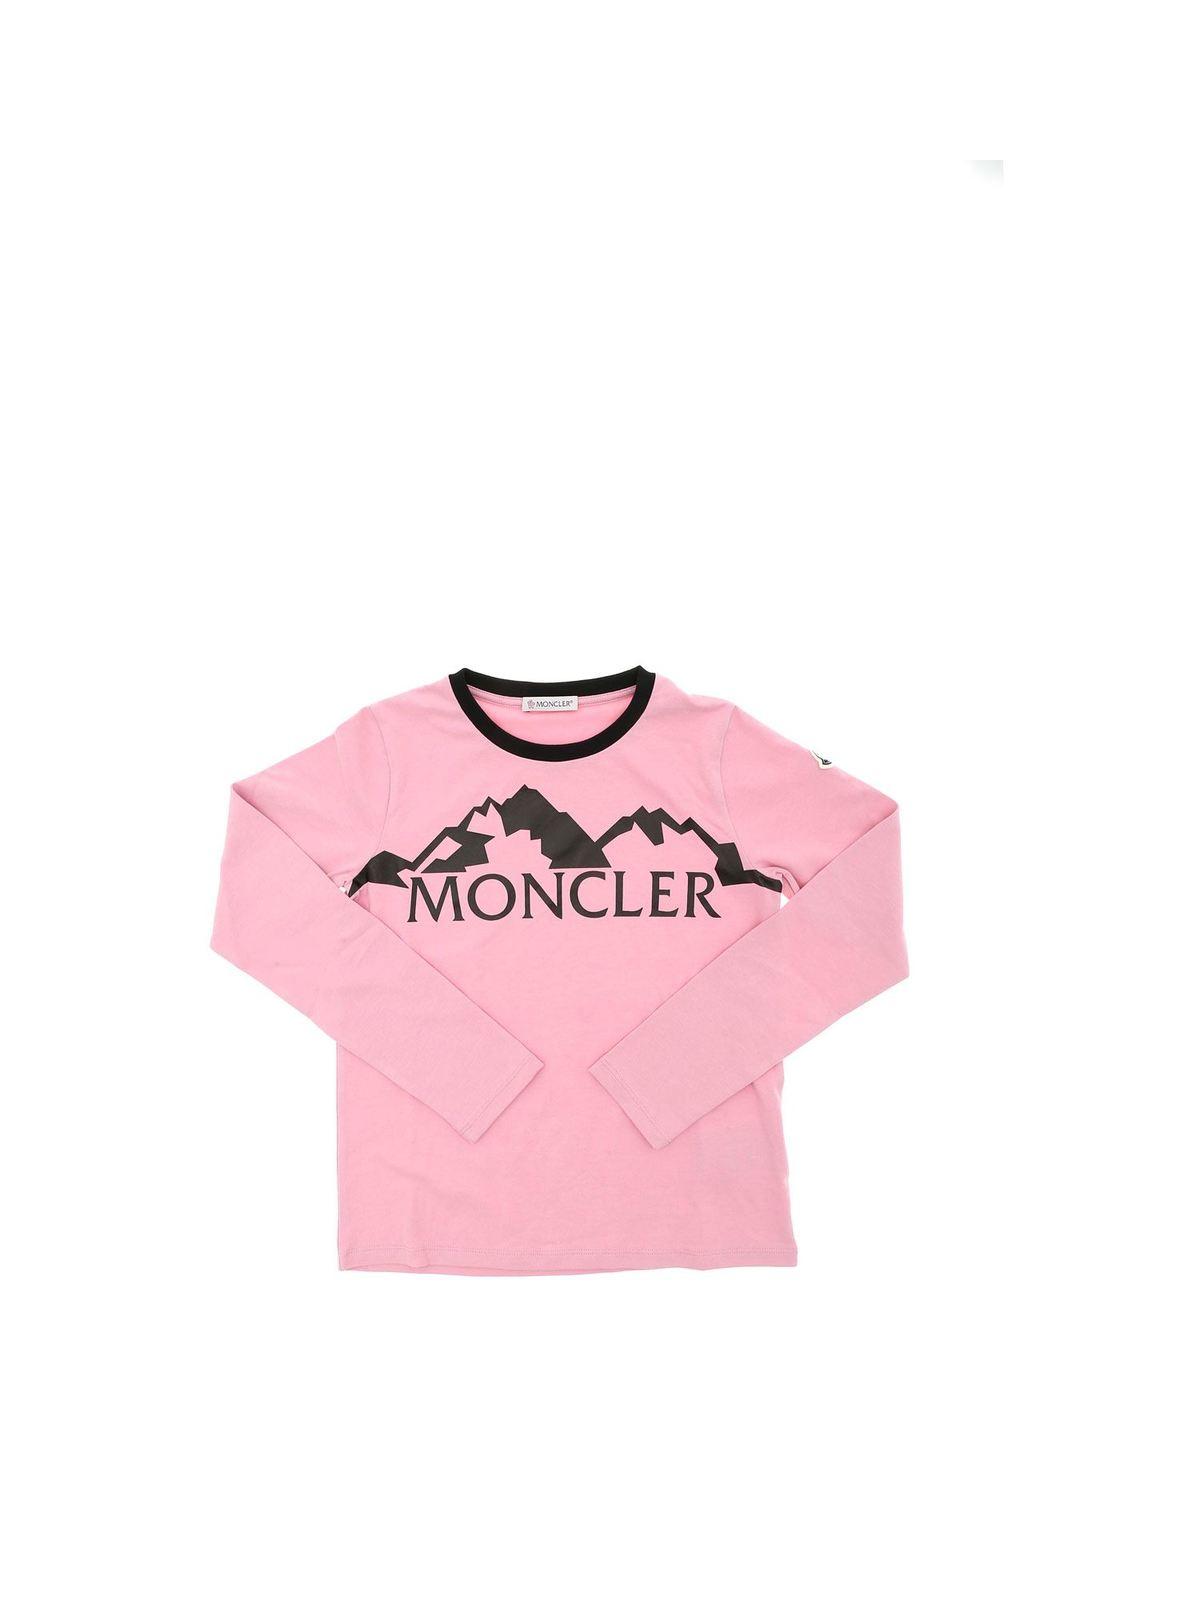 Moncler Jr Cottons BLACK LOGO PRINT T-SHIRT IN PINK